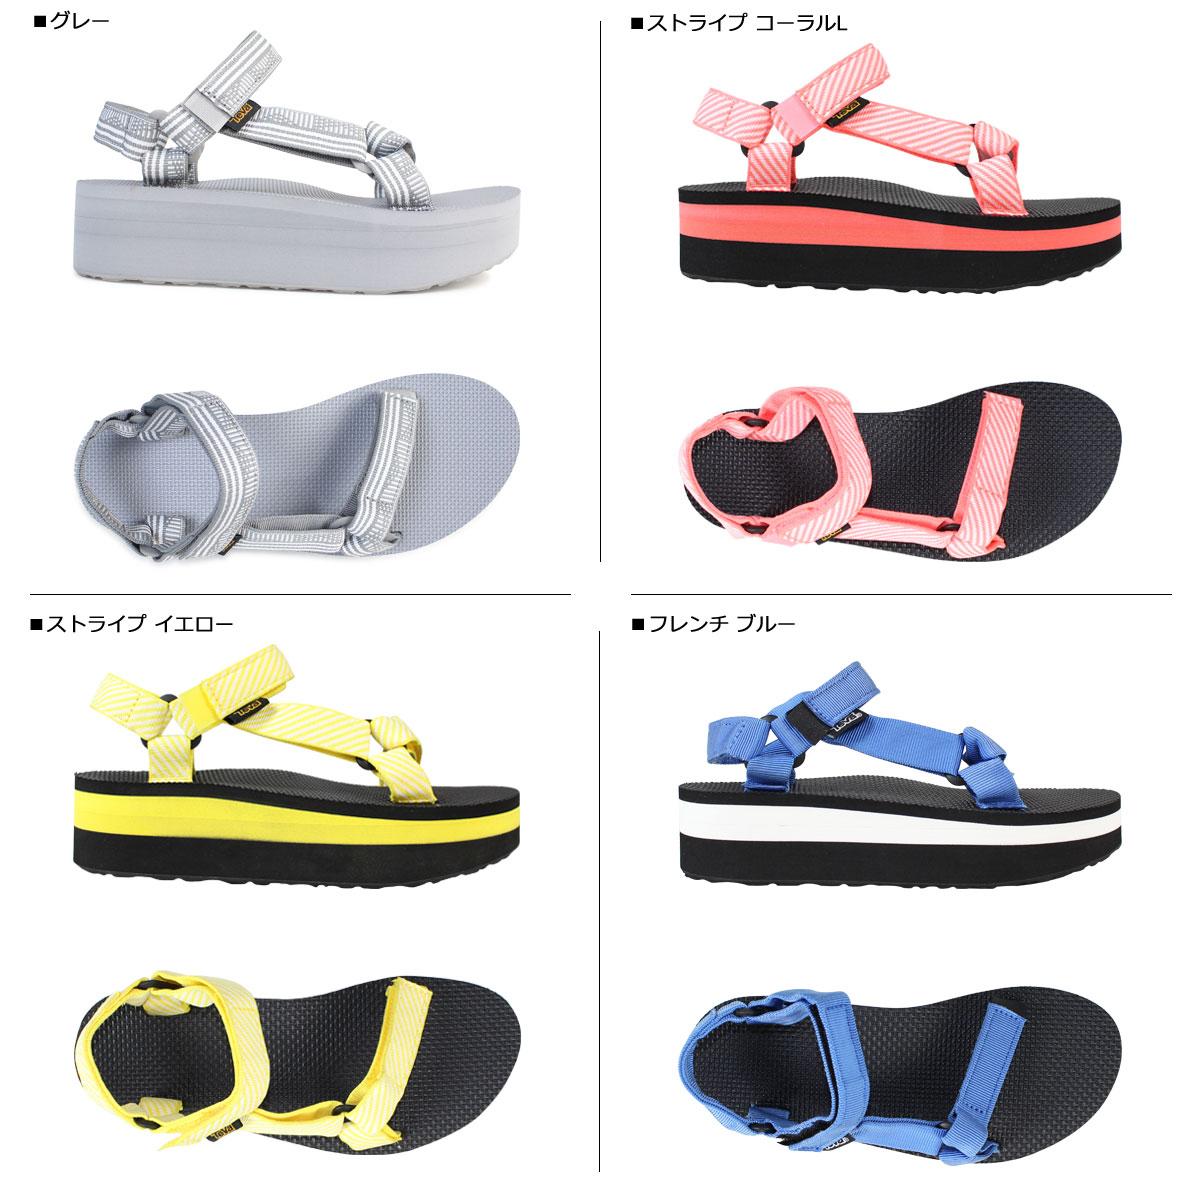 4e26fa71678 ALLSPORTS  Teva Teva Sandals Women s flat form universal W FLATFORM ...